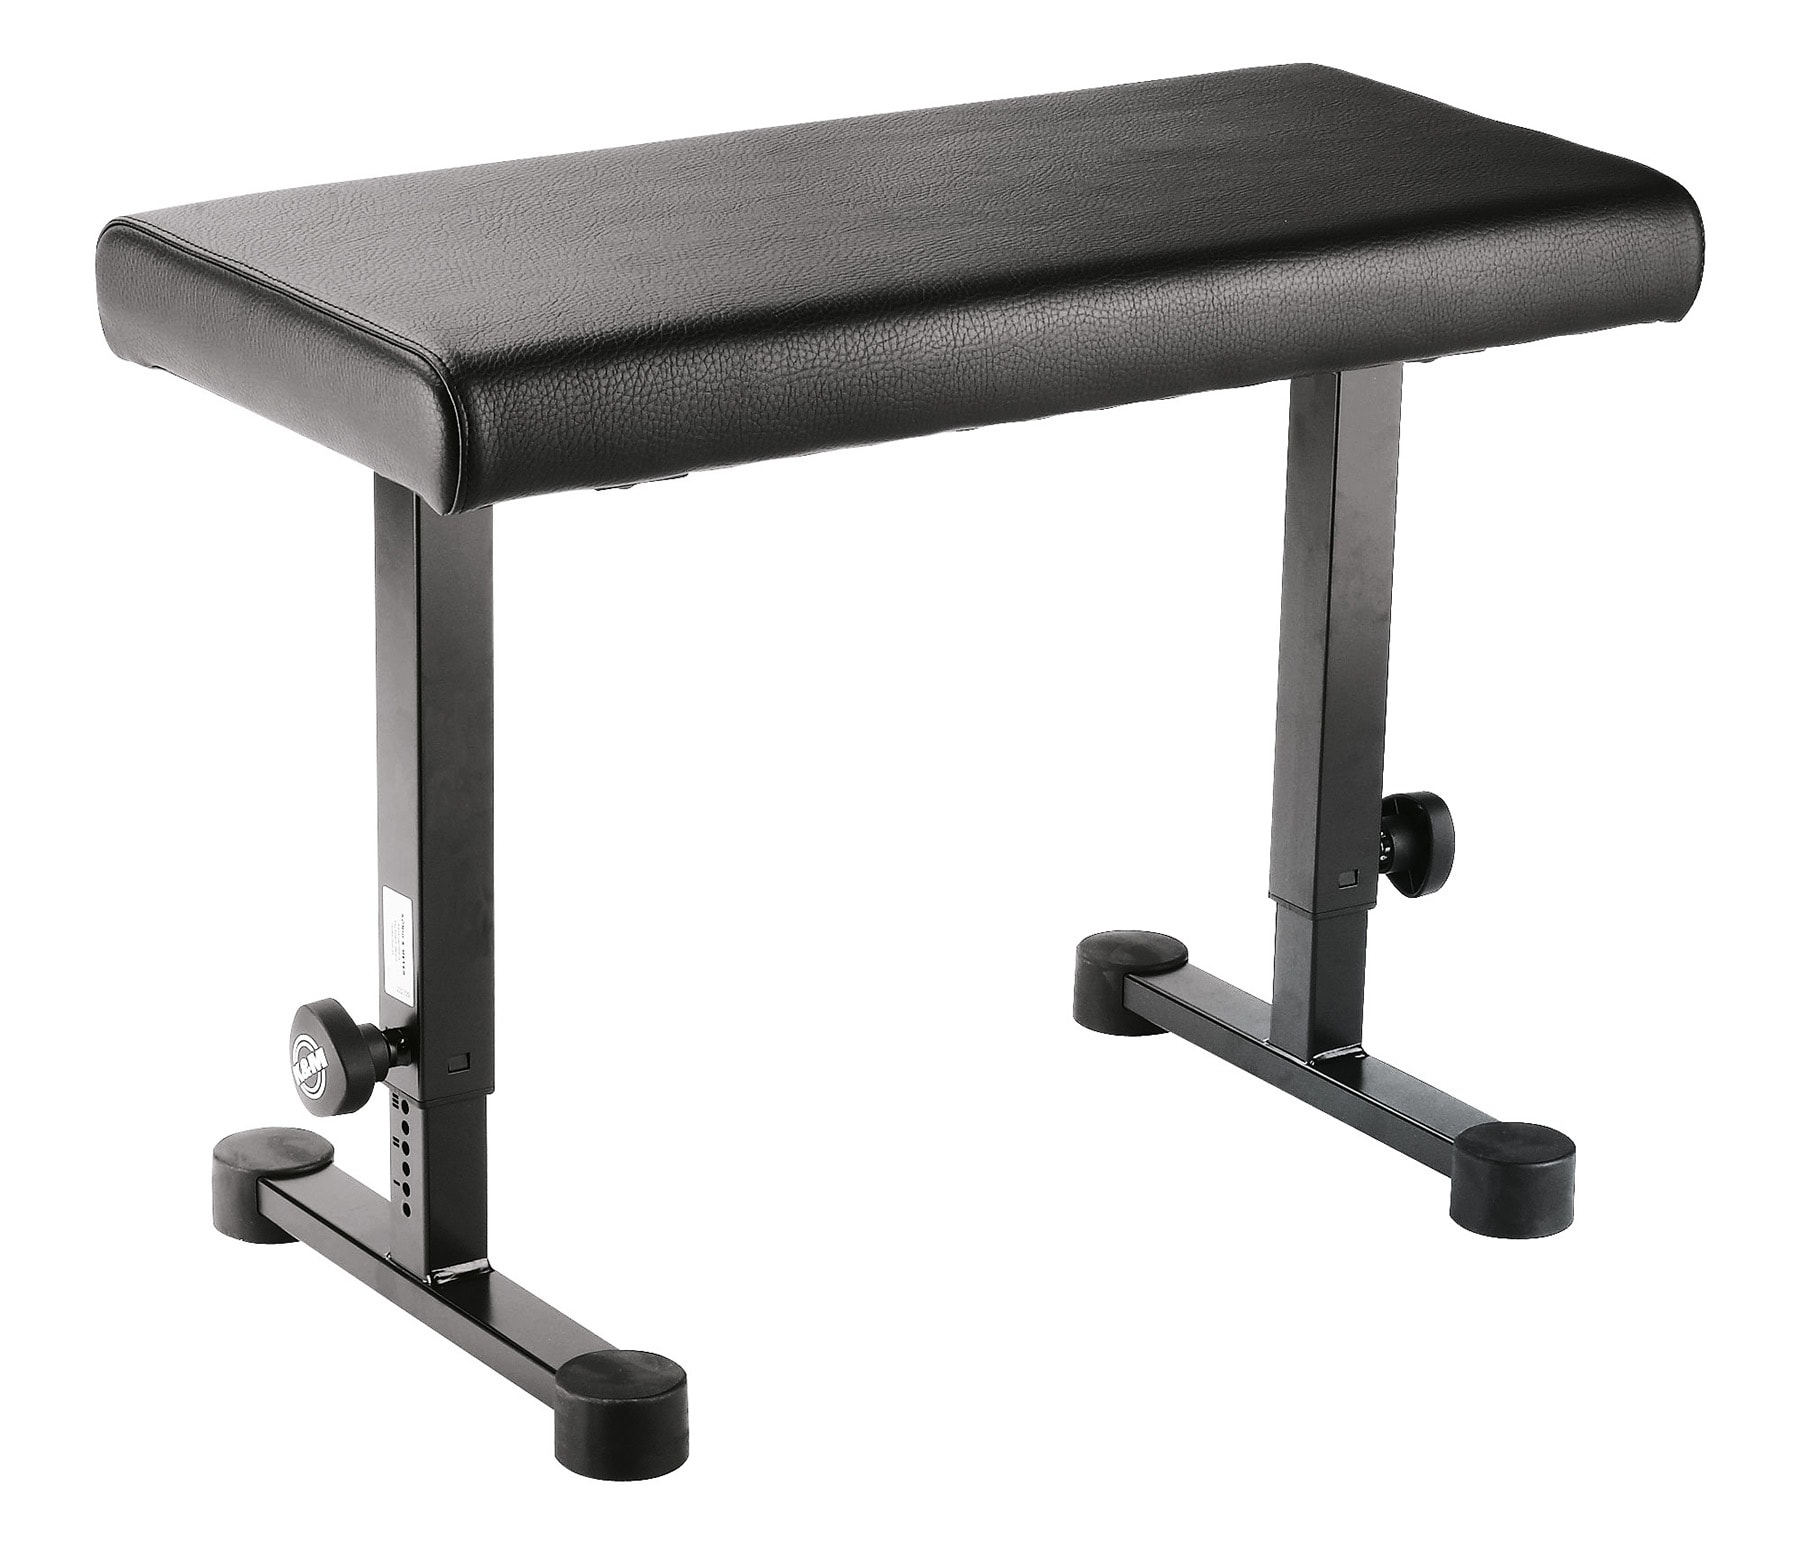 KM14085 - Piano bench